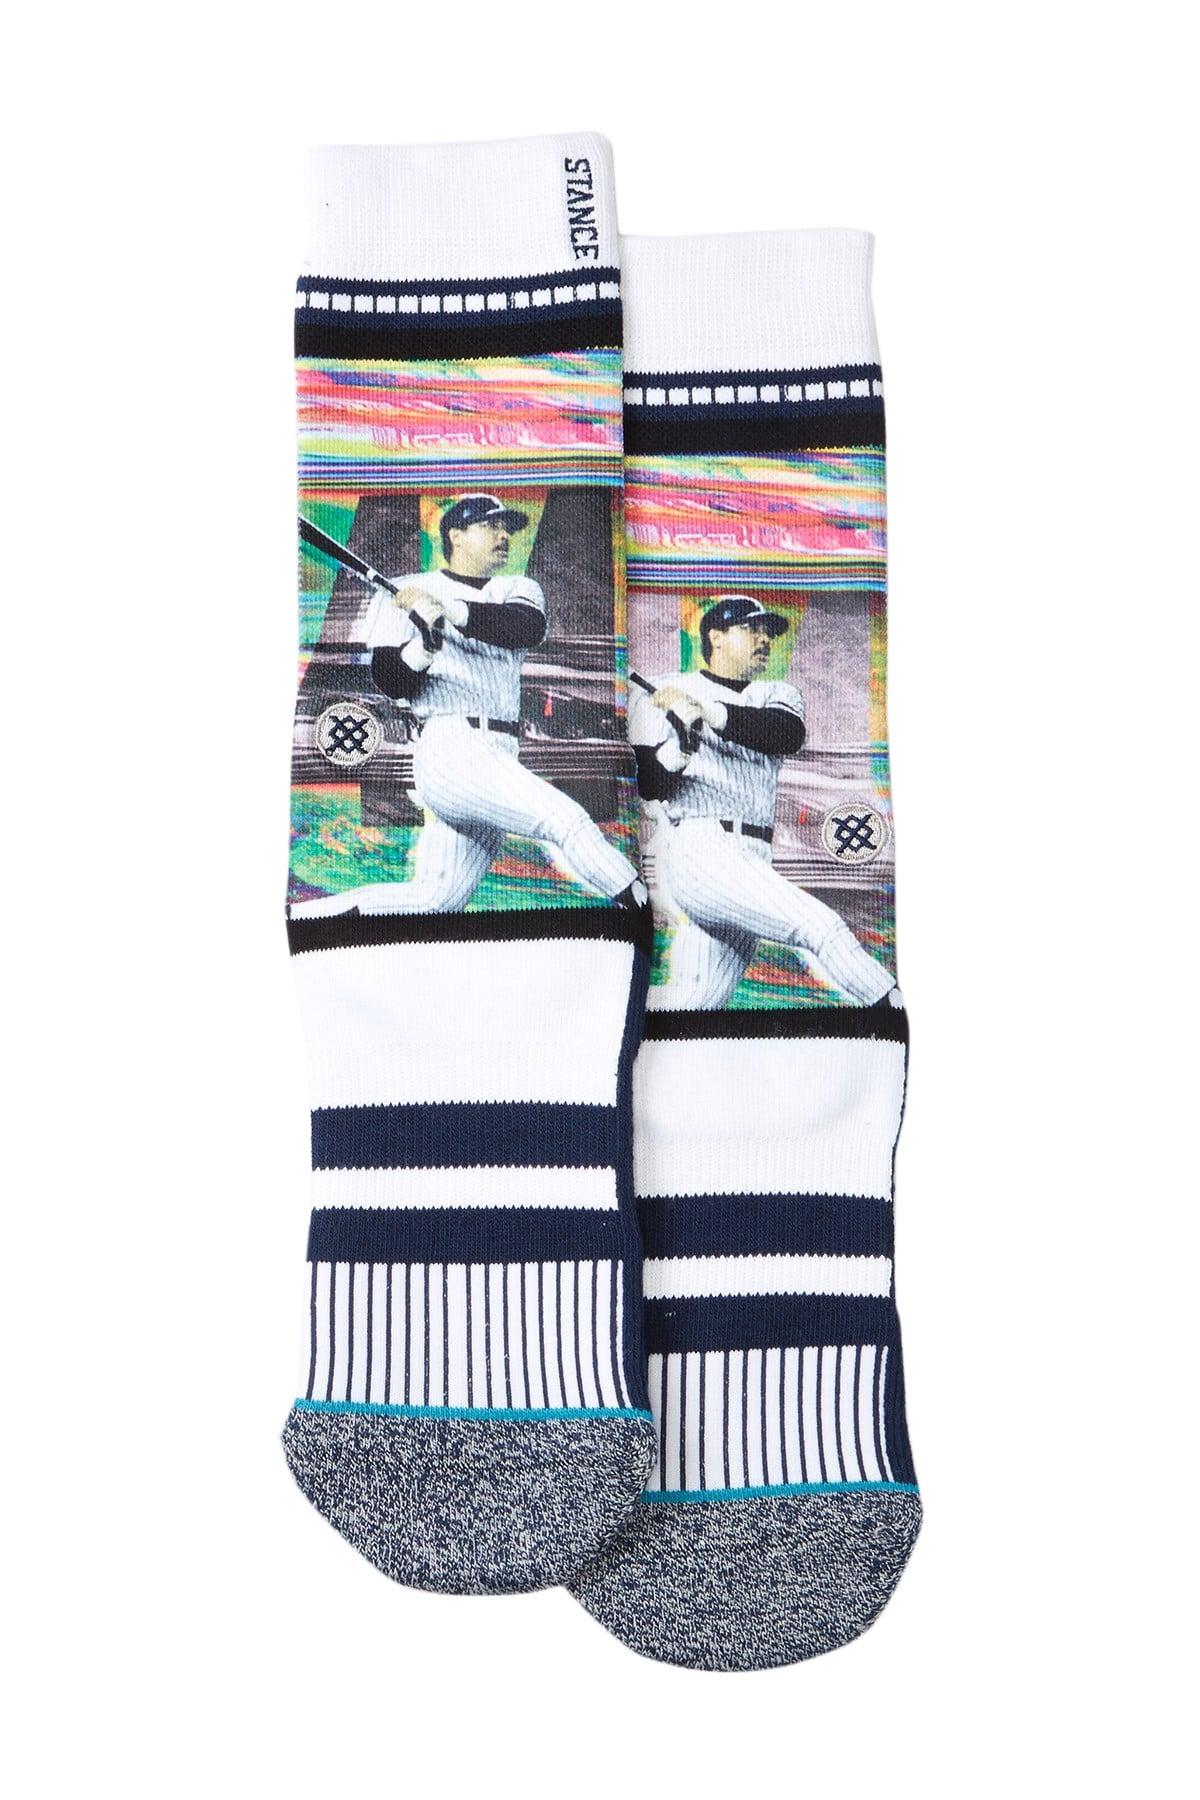 stance socks reggie jackson